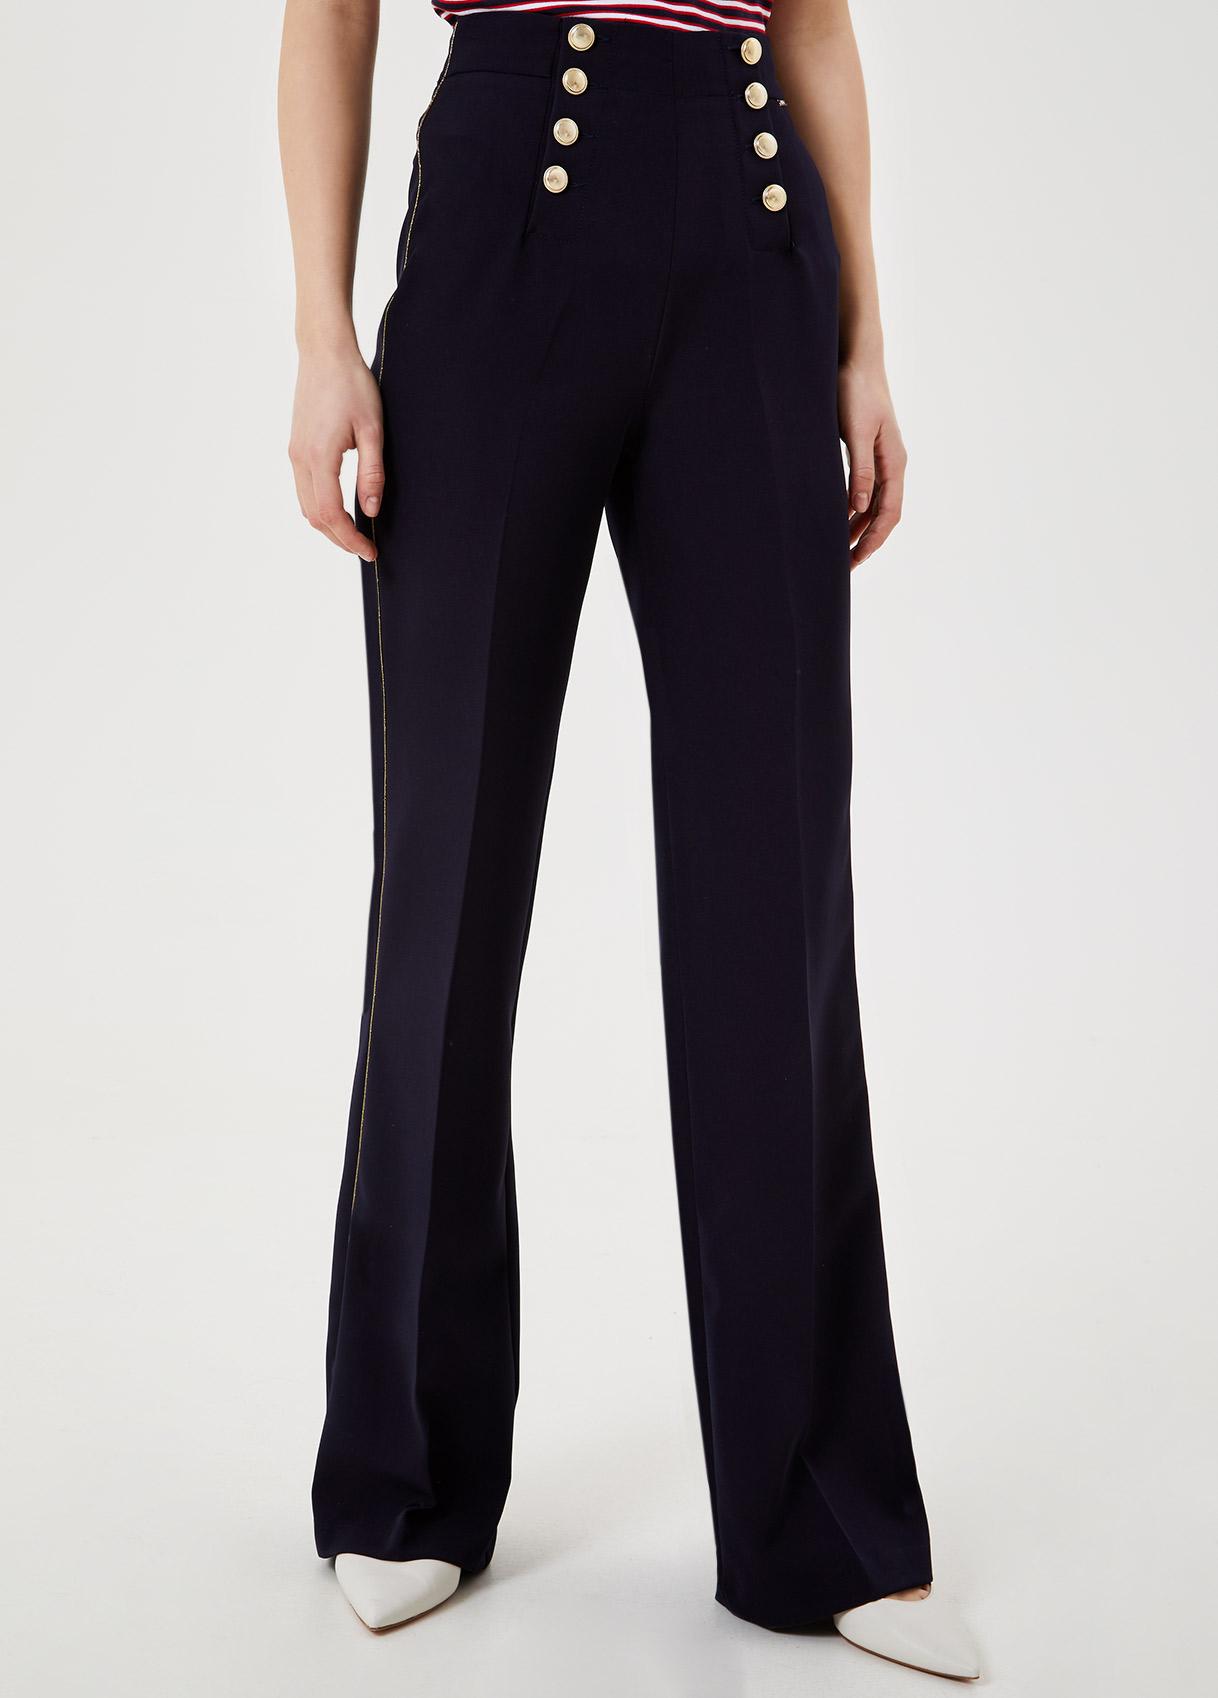 Pantalone mariniére Blu navy Liu Jo - large